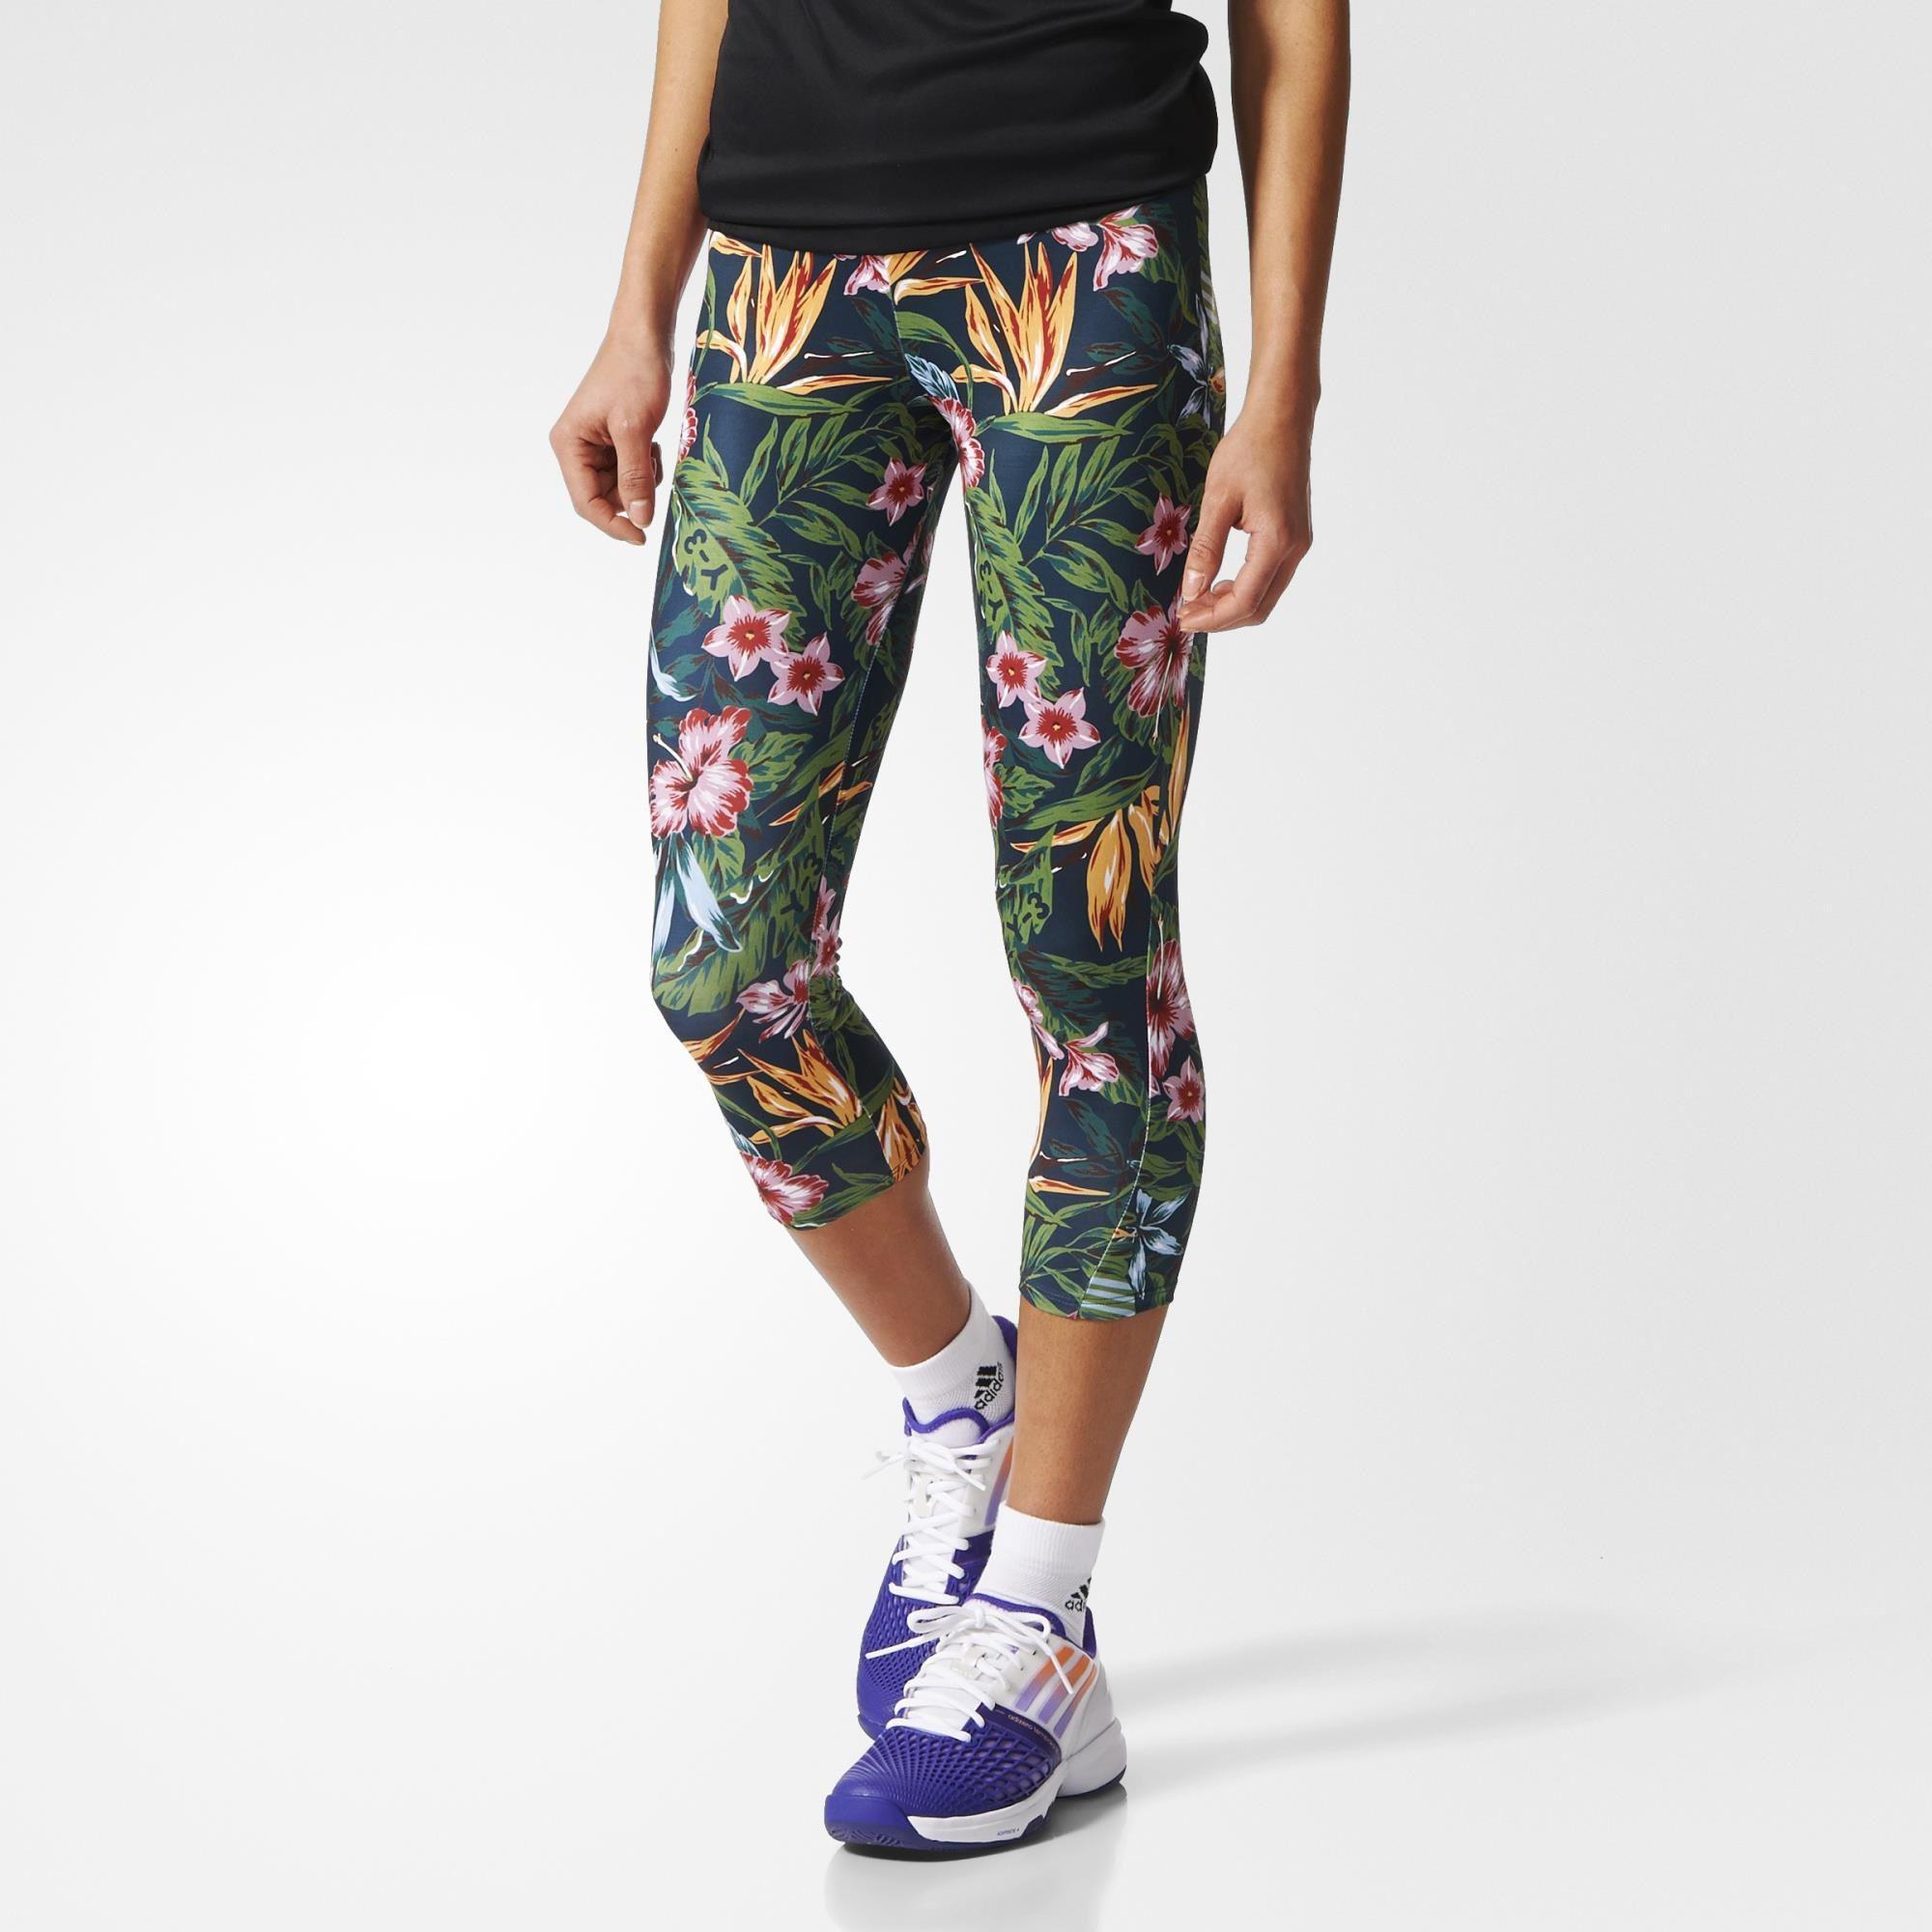 07458933e Adidas Womens Y-3 Roland Garros Pants - Flower - Tennisnuts.com